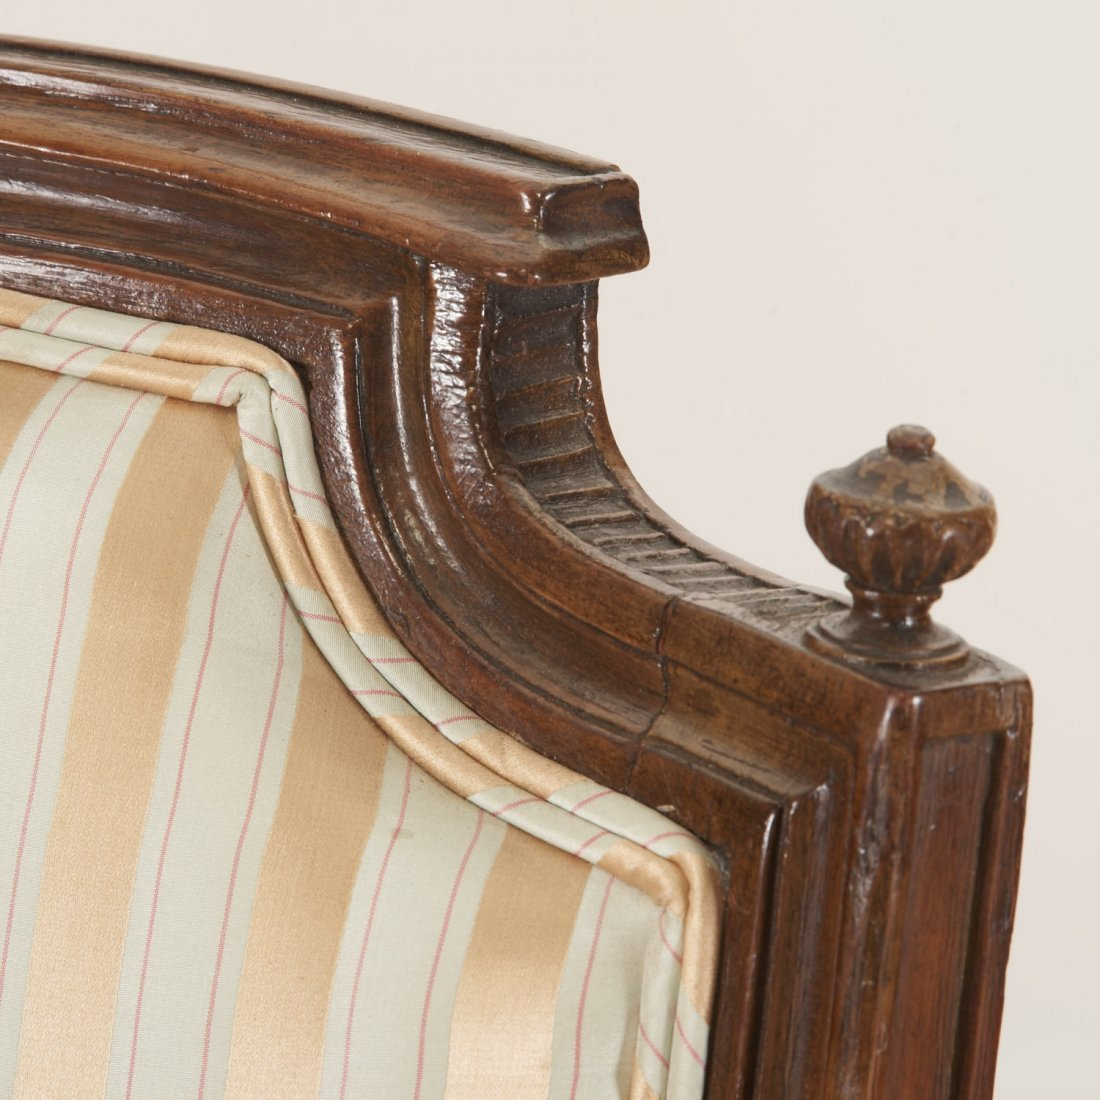 Pr Directoire silk upholstered mahogany fauteuils - 7